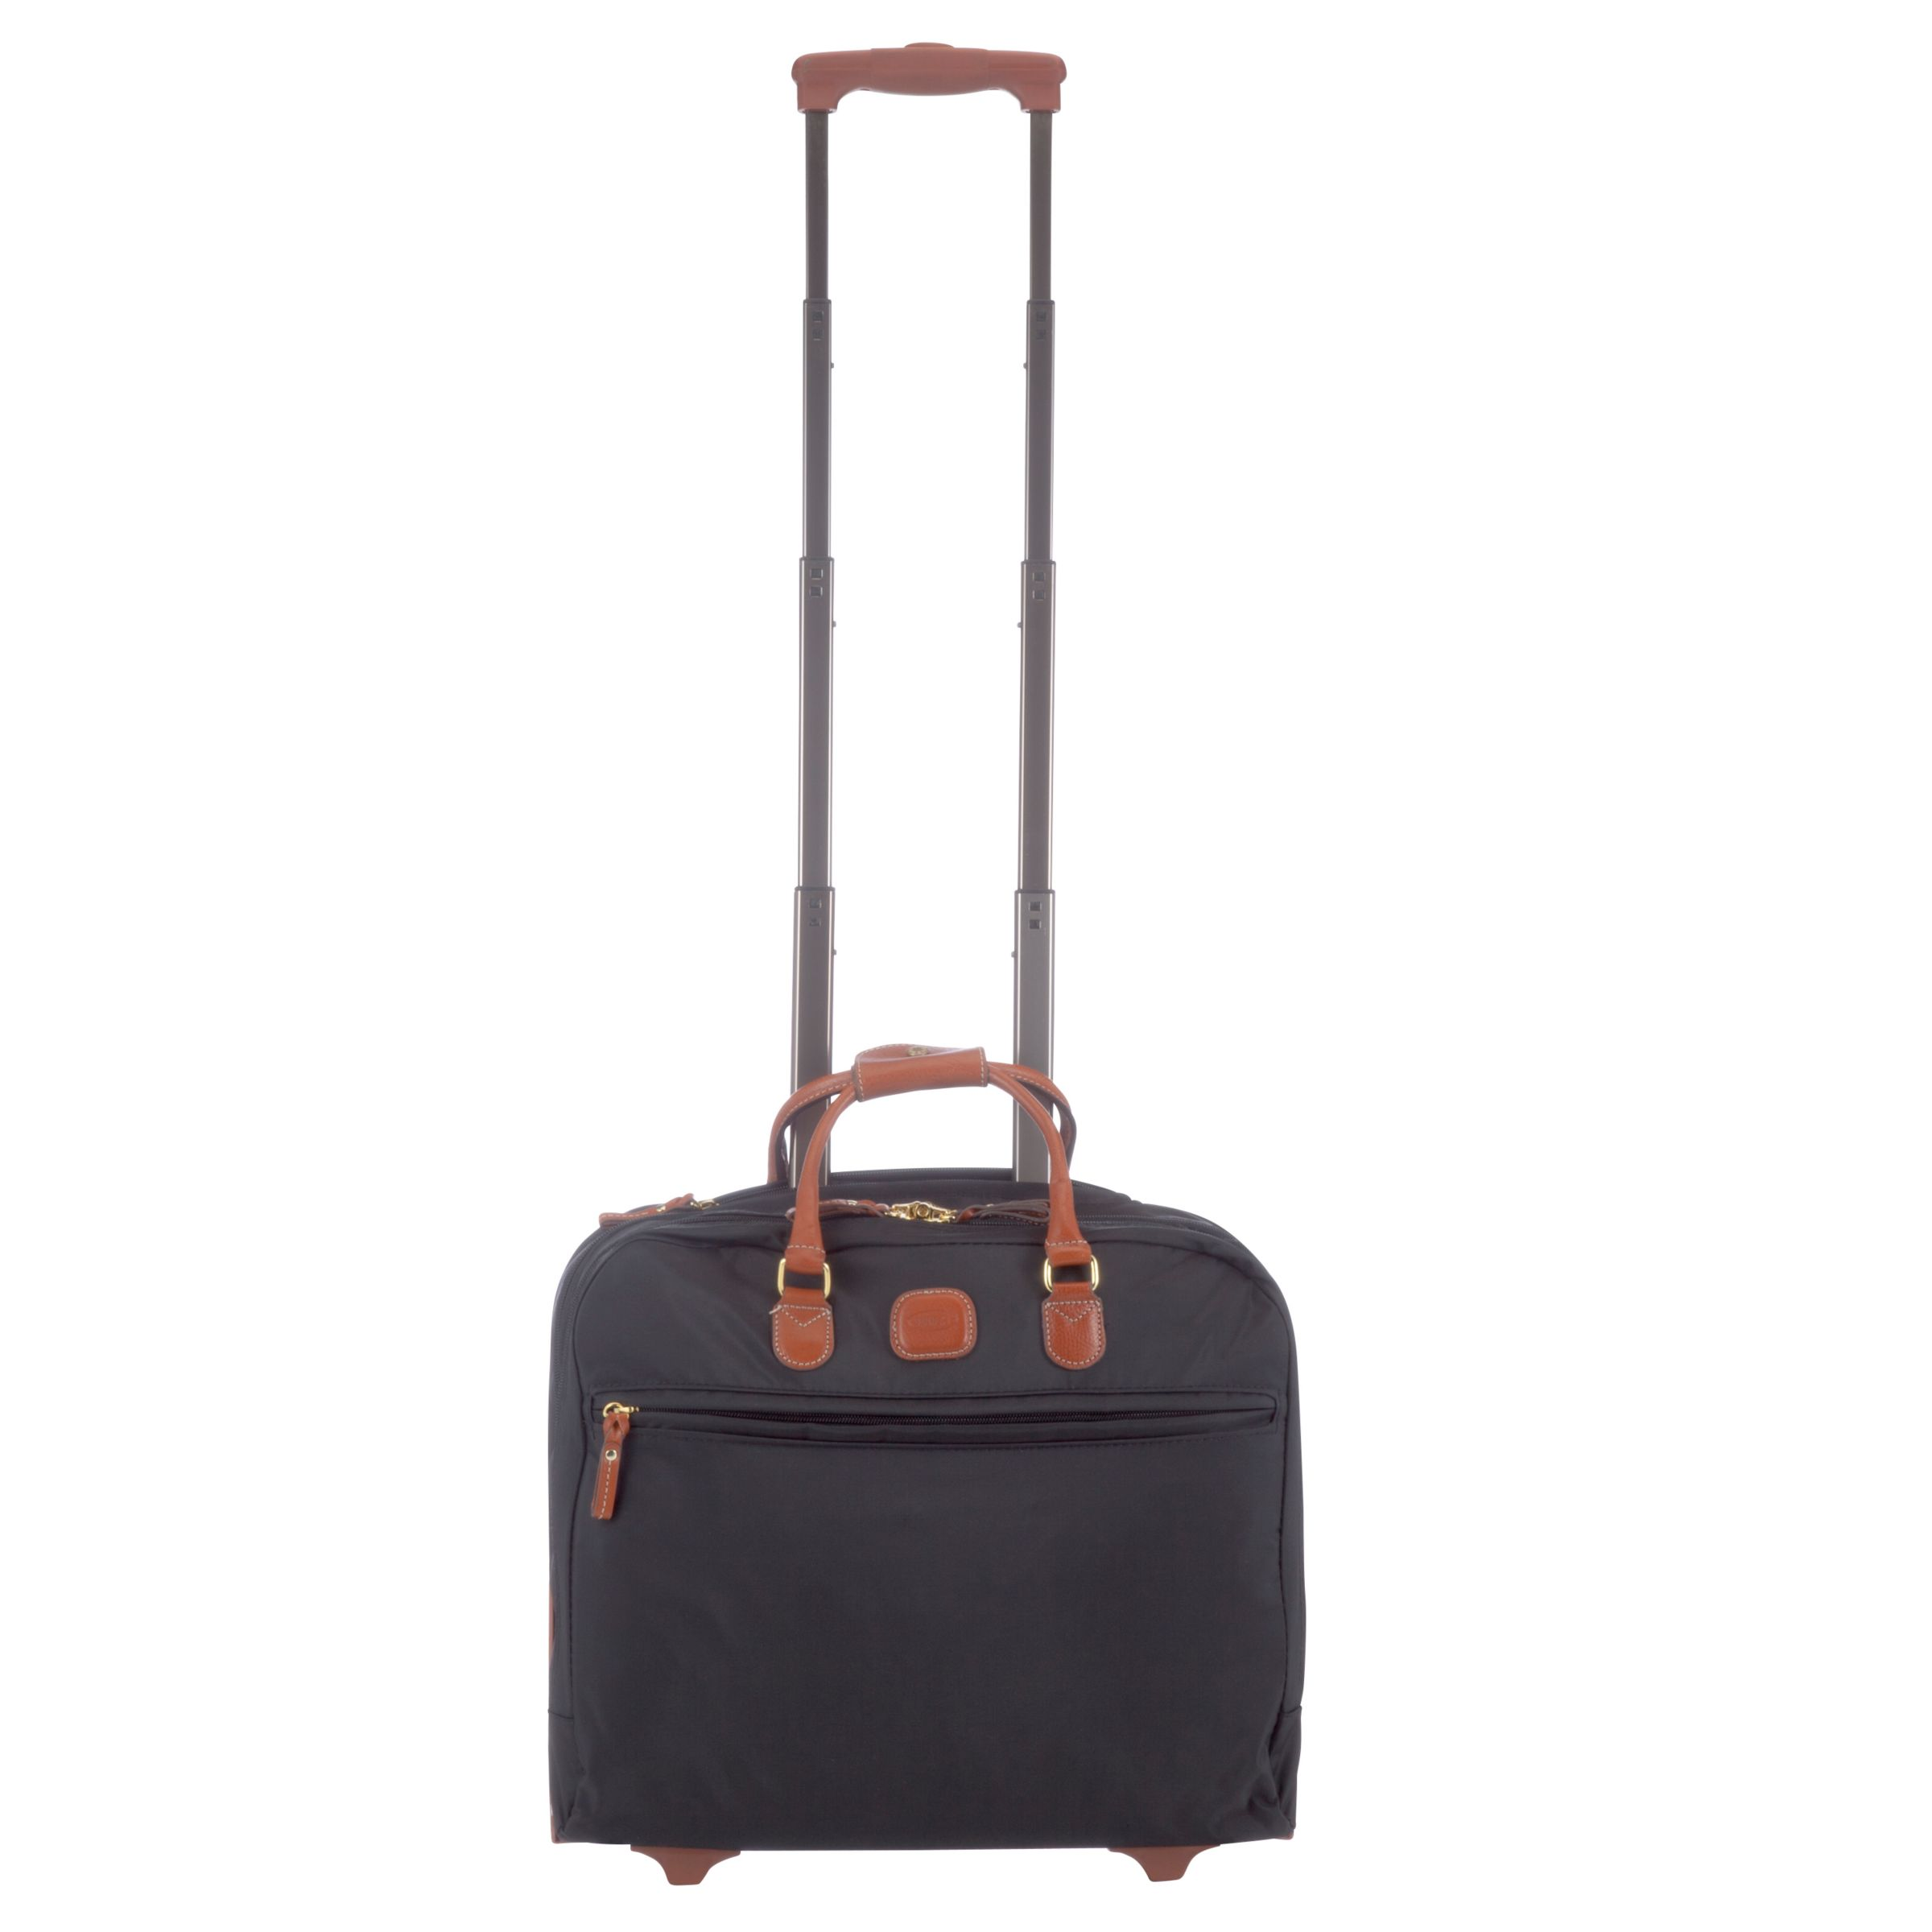 Bric's Bric's X-Travel Business Briefcase, Black